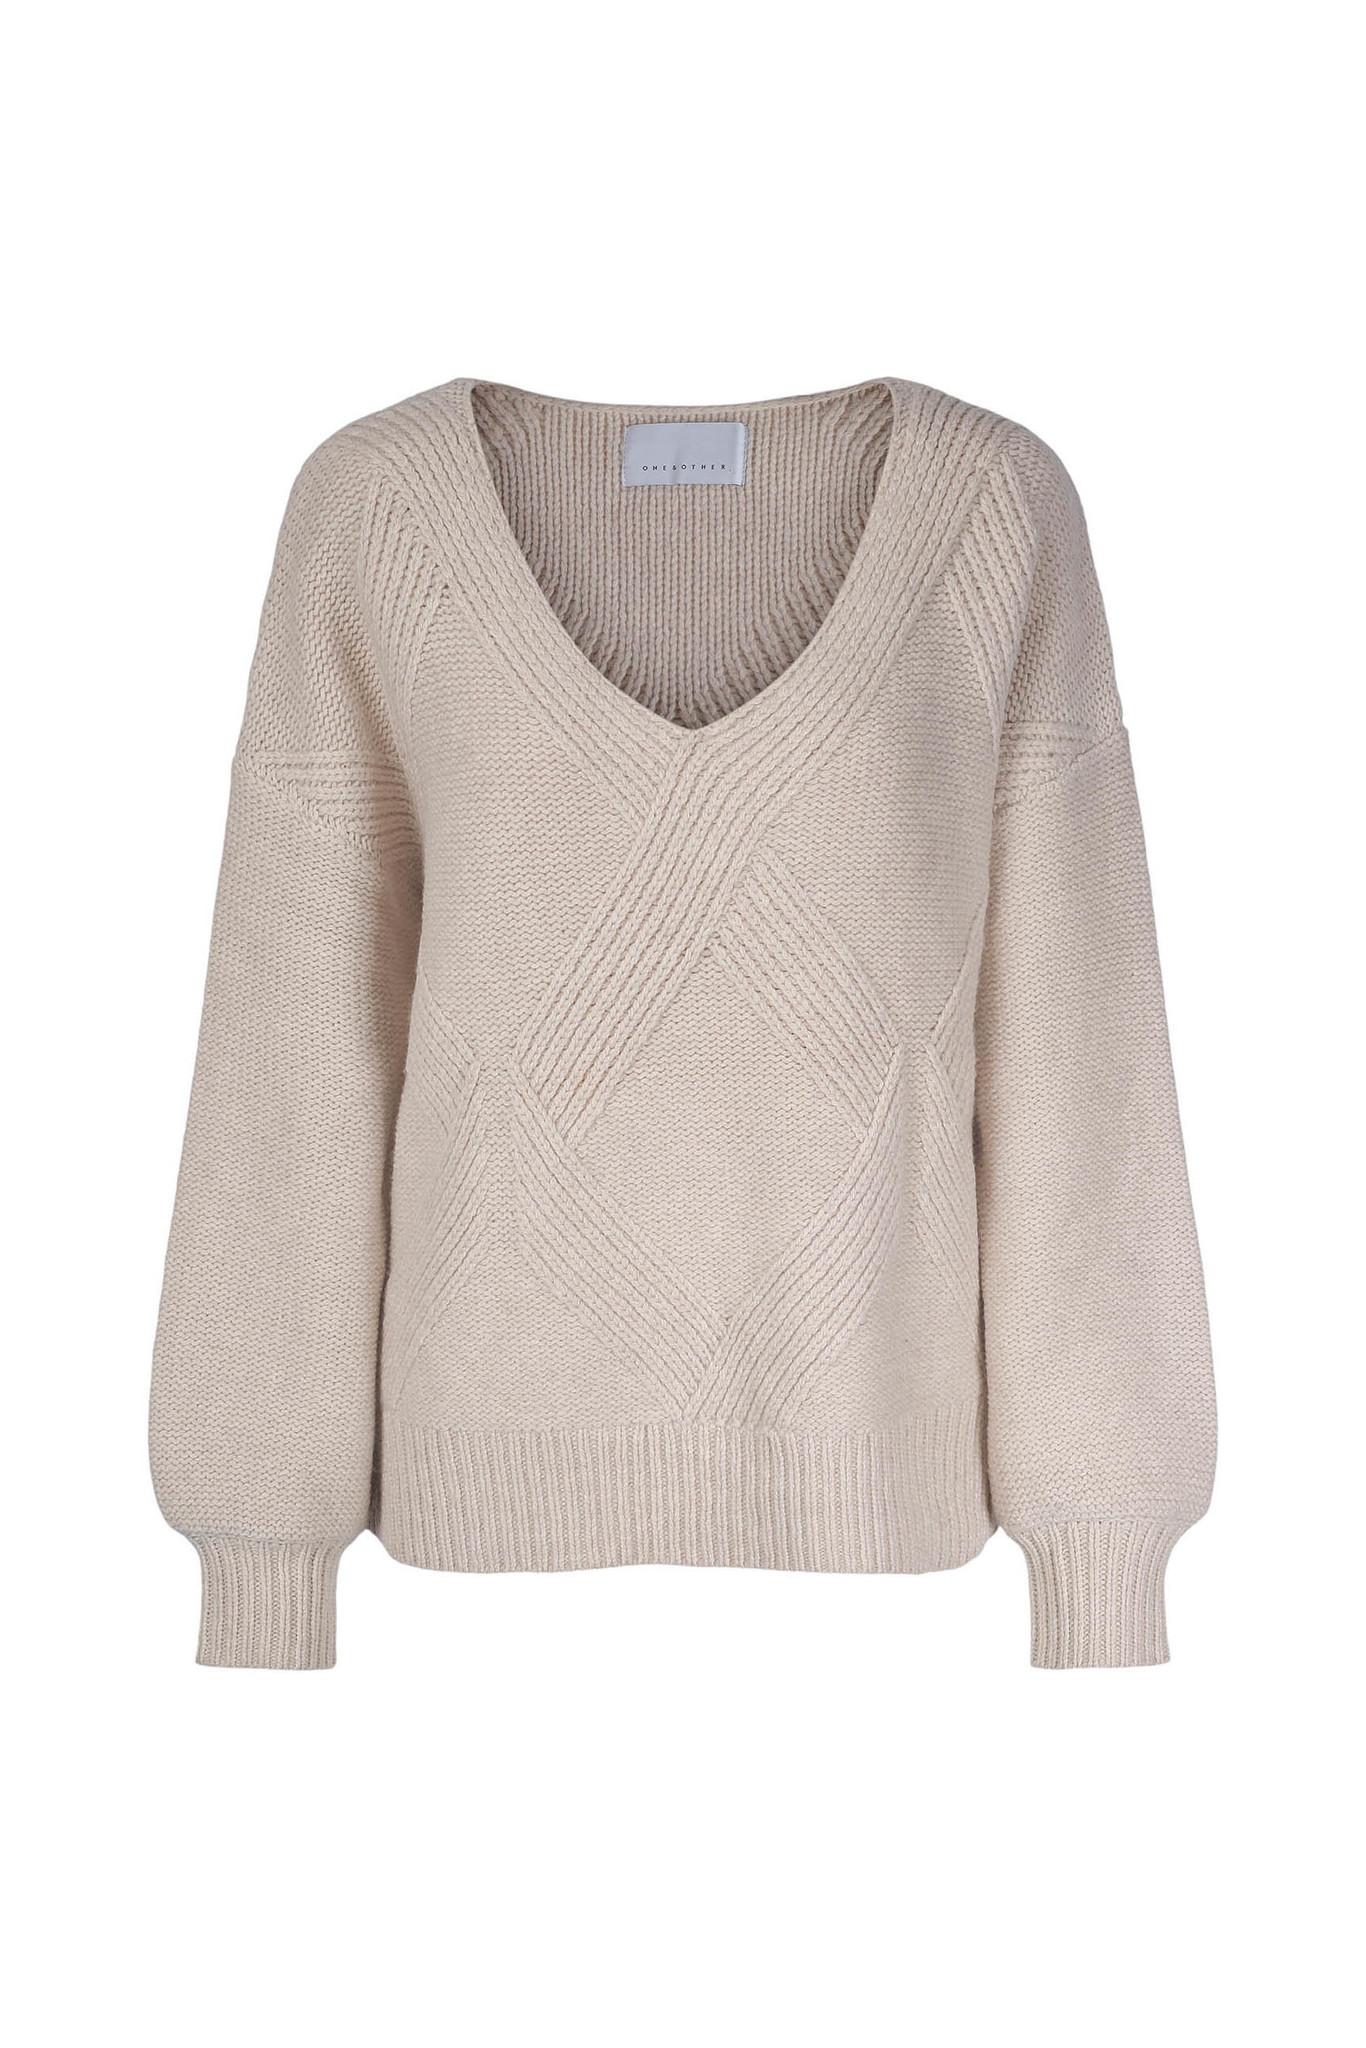 Hermine Sweater - Antique White-1